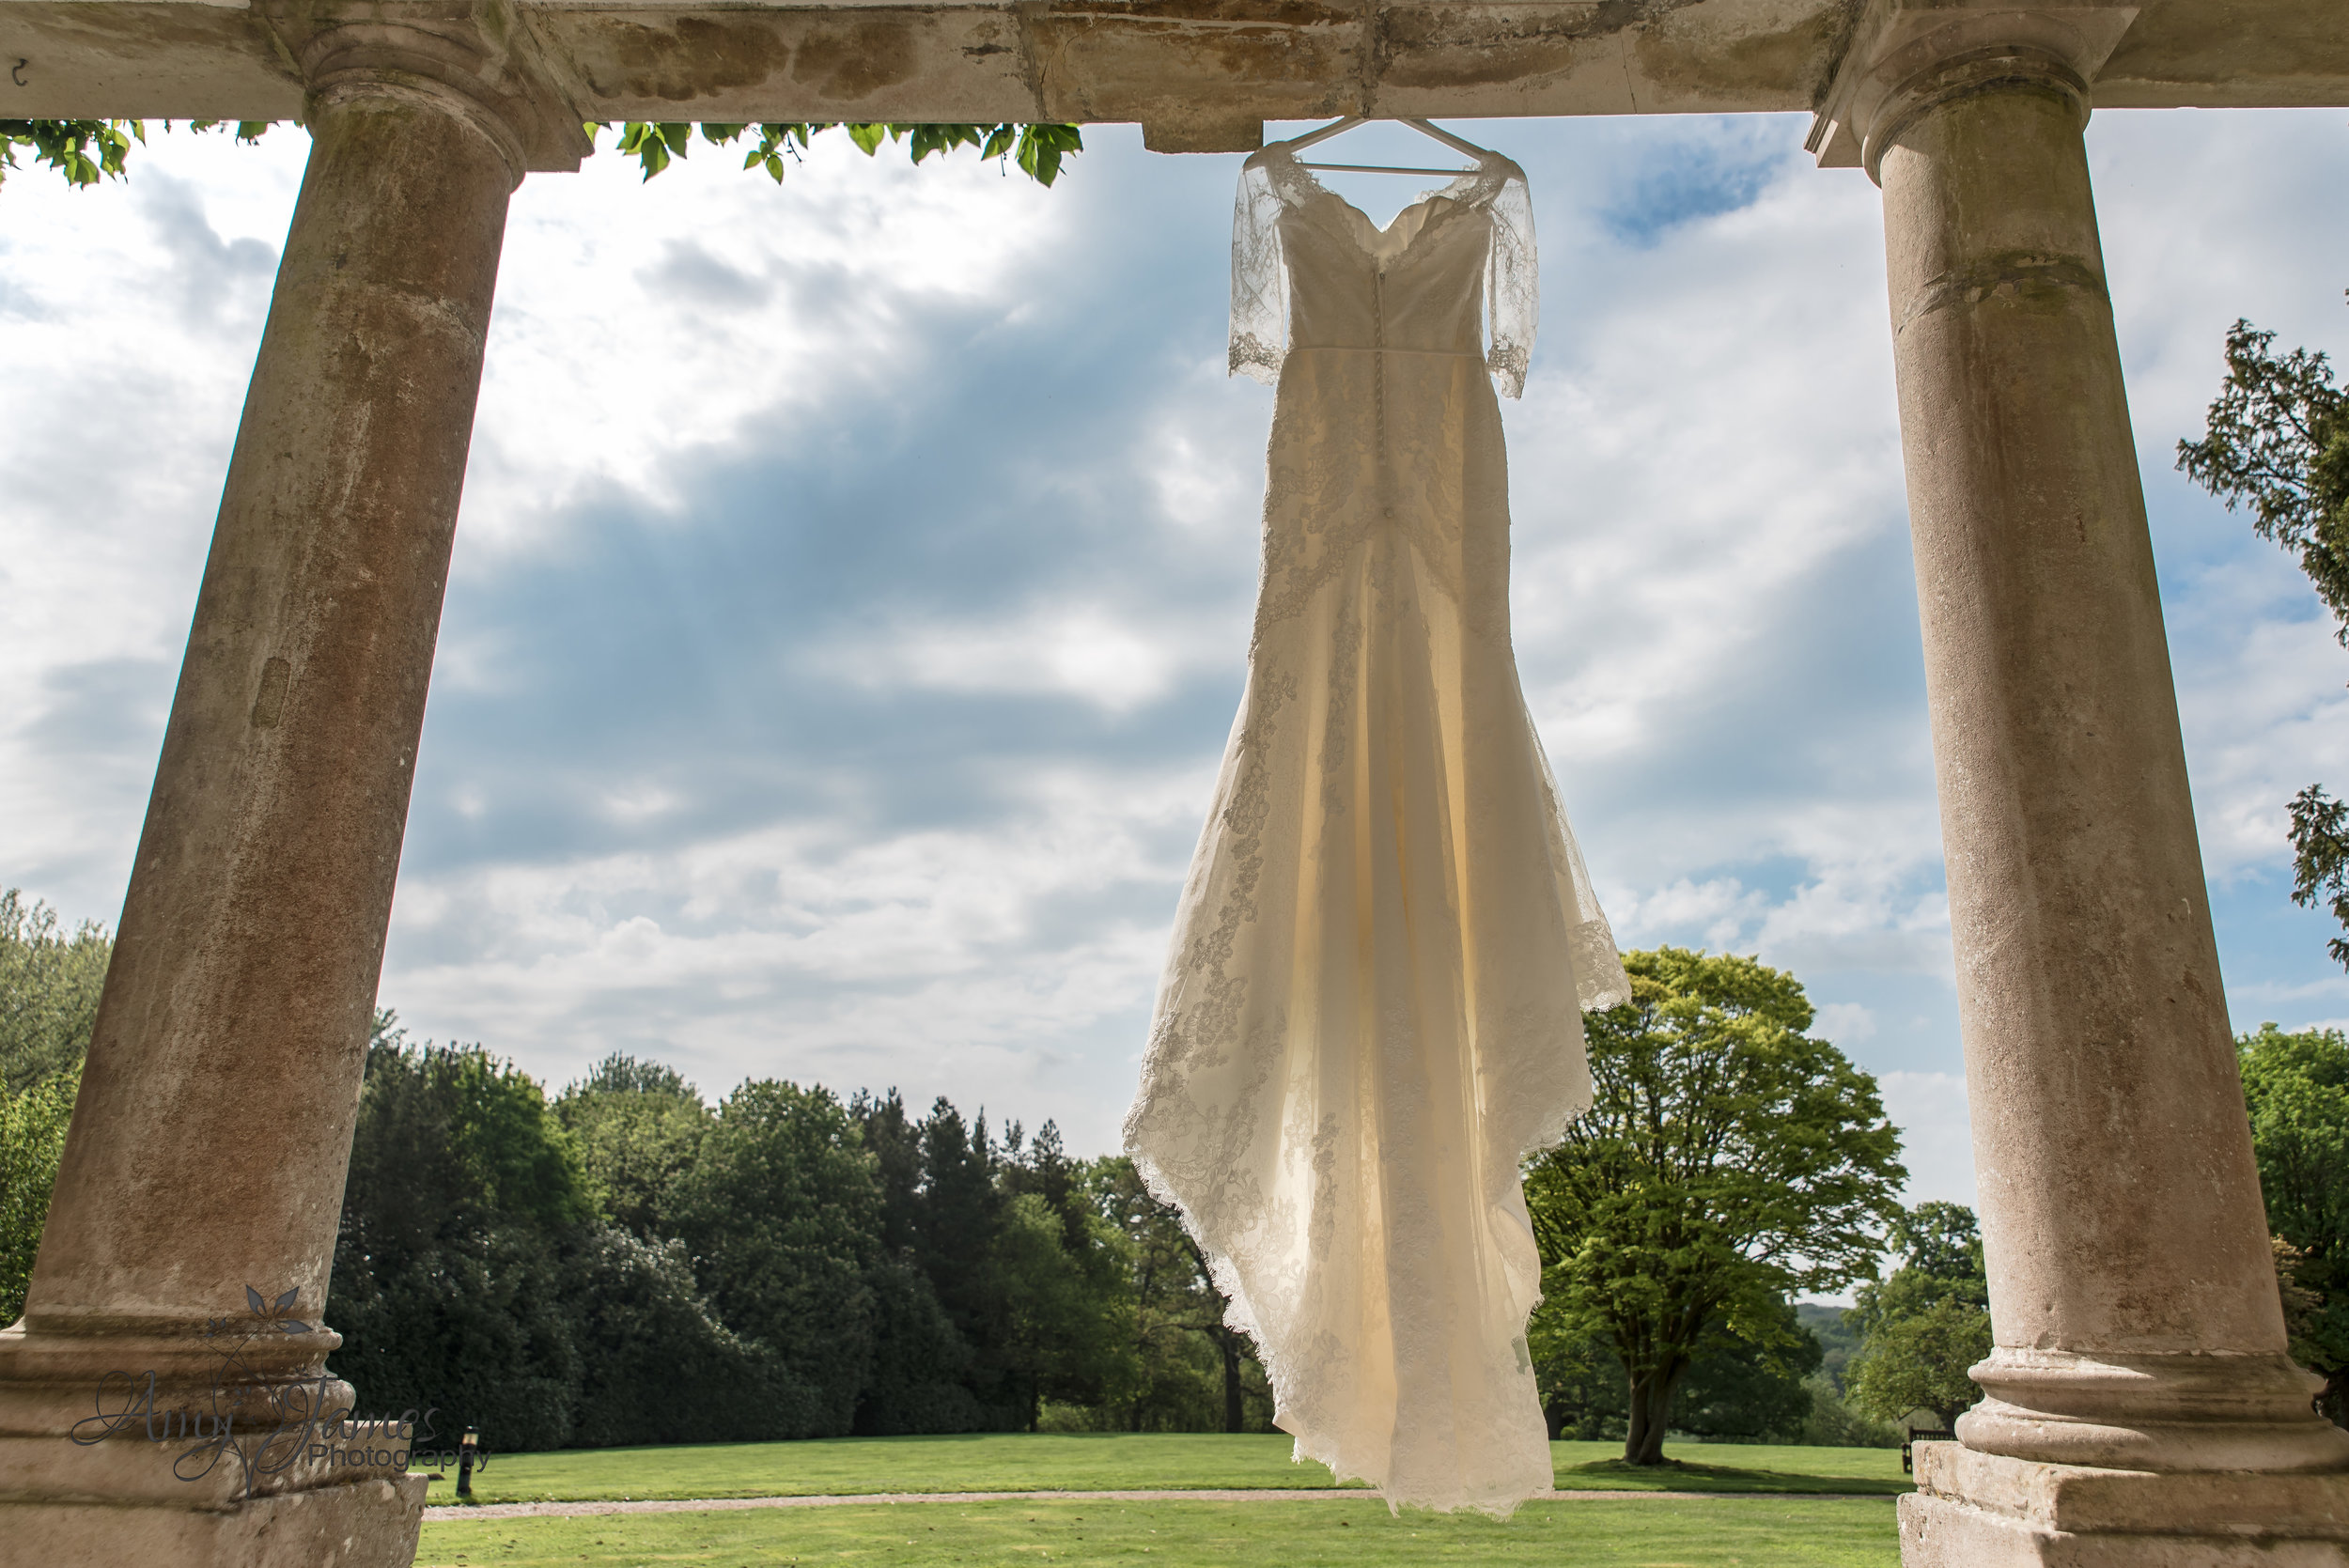 Hamphire Wedding Photographer | Amy James Photography | Highfield Park Wedding Venue | Highfield Park Wedding Photographer | Outdoor wedding ceremony | UK outdoor wedding venue | Wedding dress